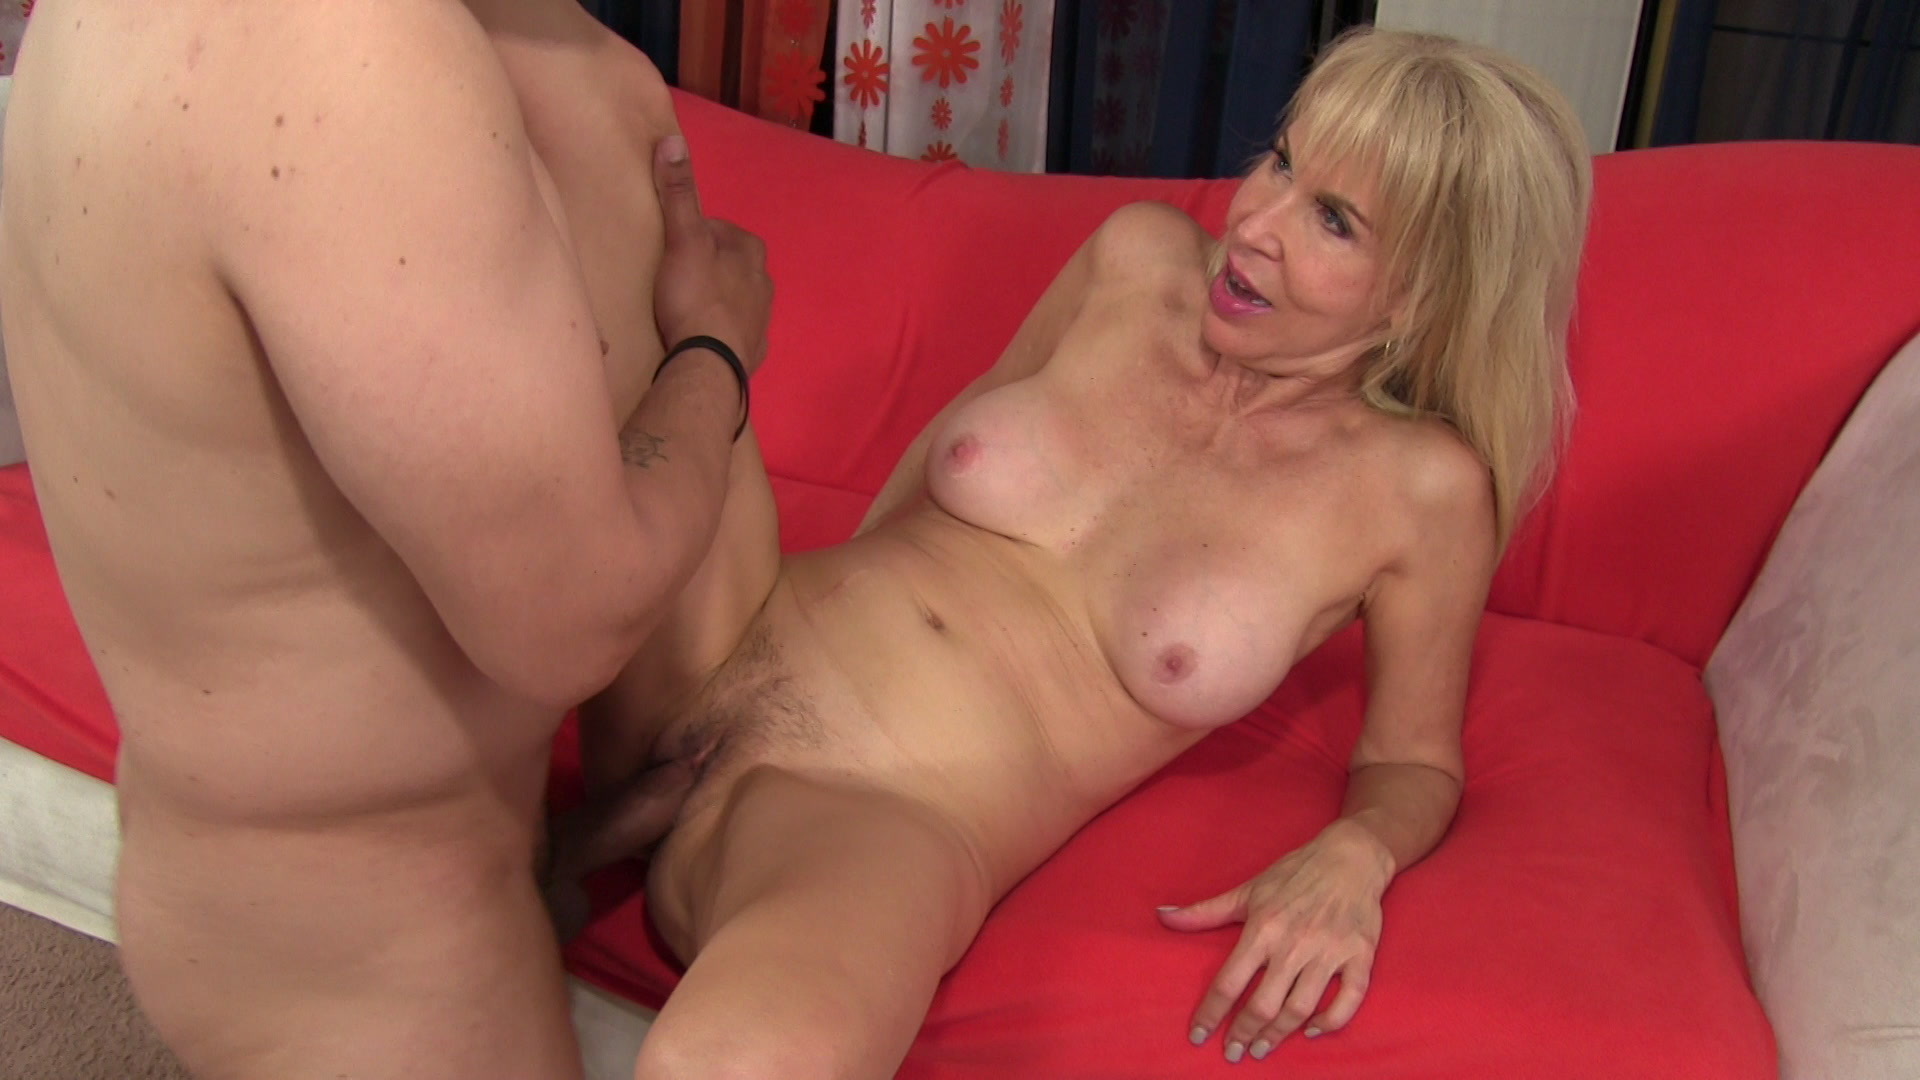 Hot mature mommy sex, mature granny porn, hot mature moms, mature younger sex